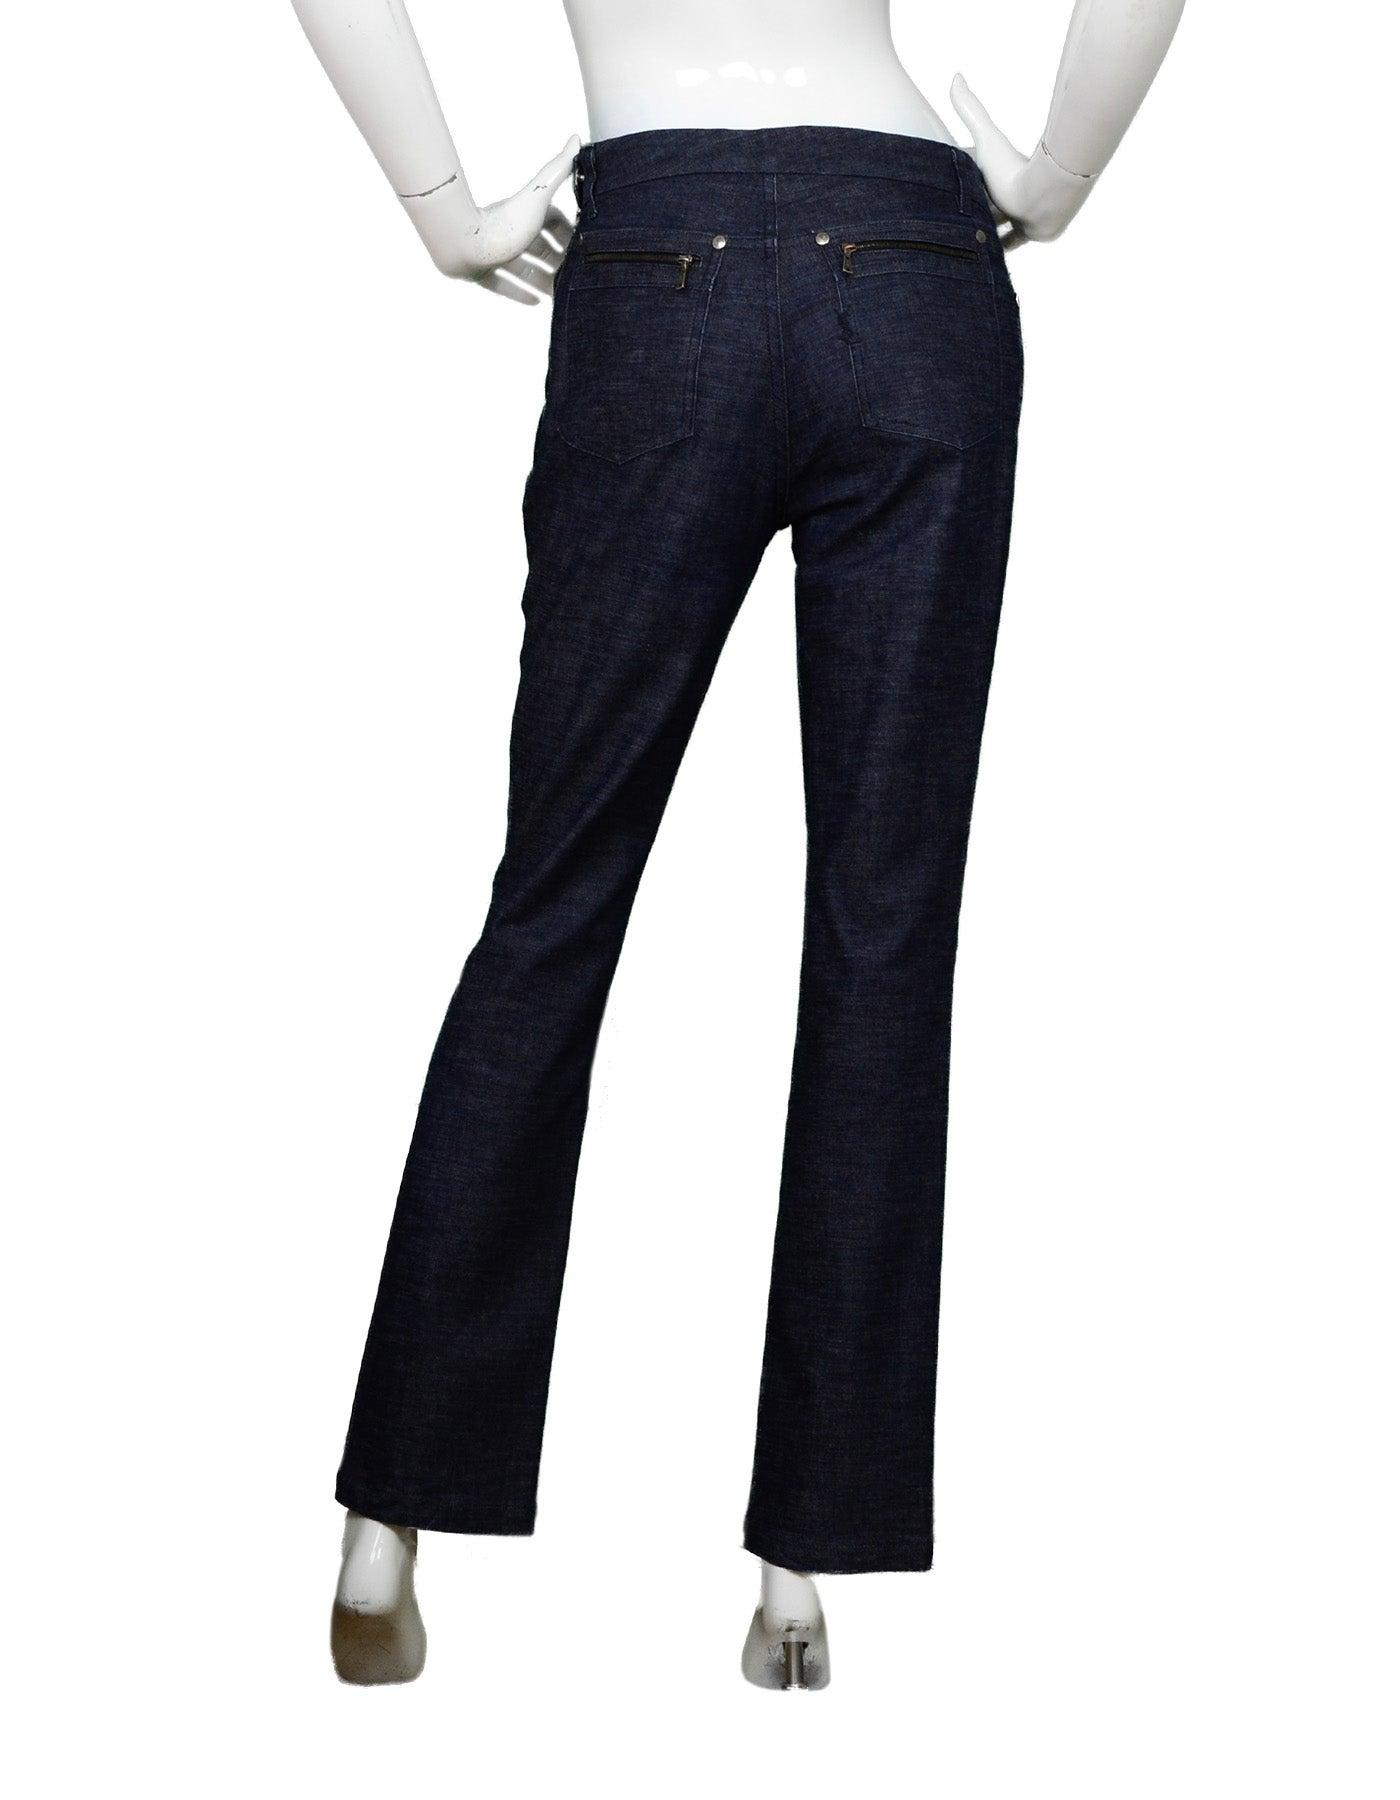 6fcae0a485e Yves Saint Laurent YSL Dark Denim Pant/Jacket 2 Piece Set Sz 38 For Sale at  1stdibs